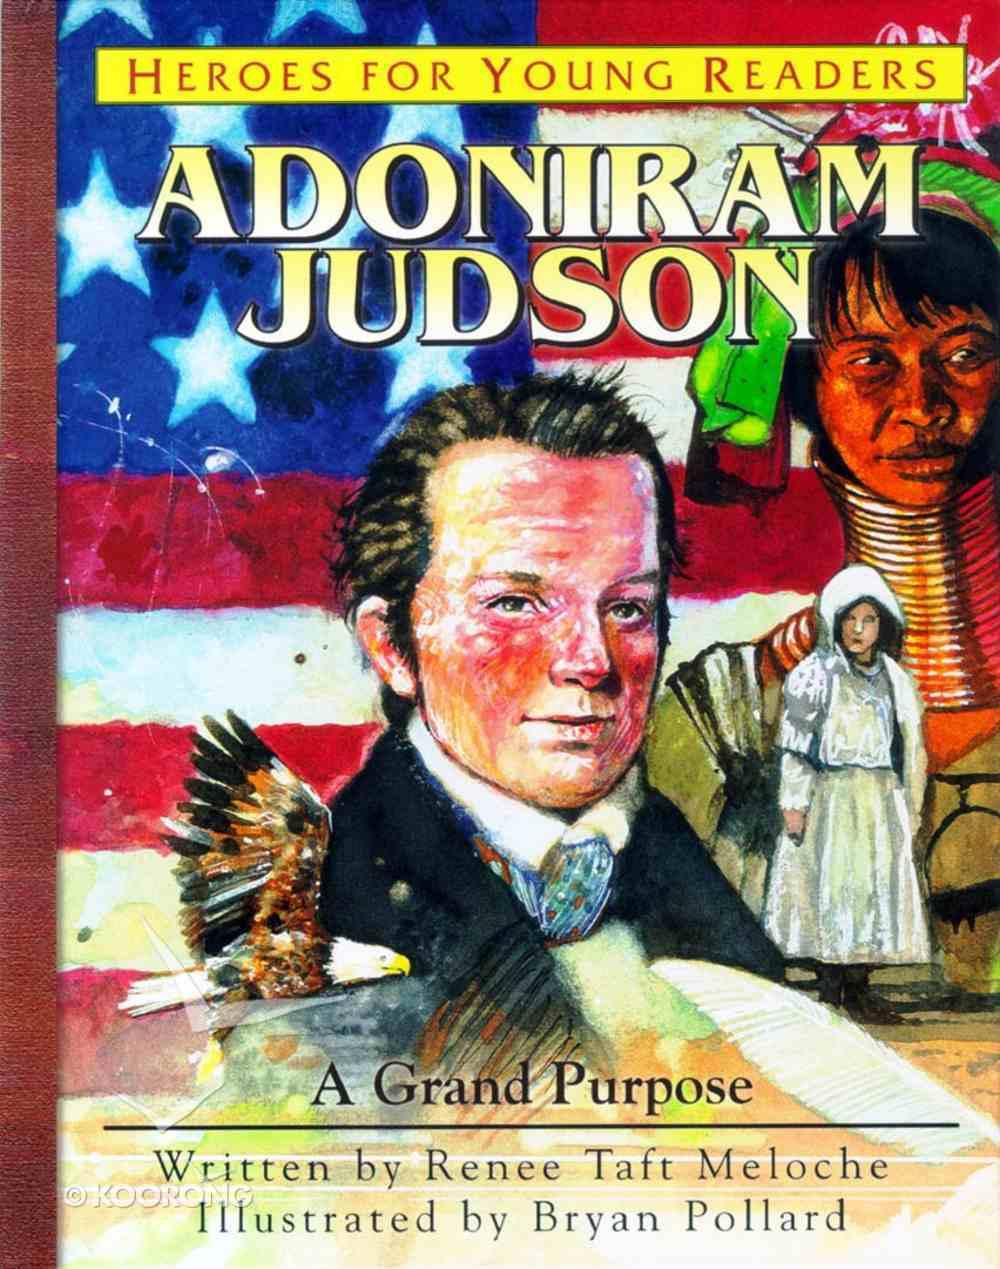 Adoniram Judson - a Grand Purpose (Heroes For Young Readers Series) Hardback